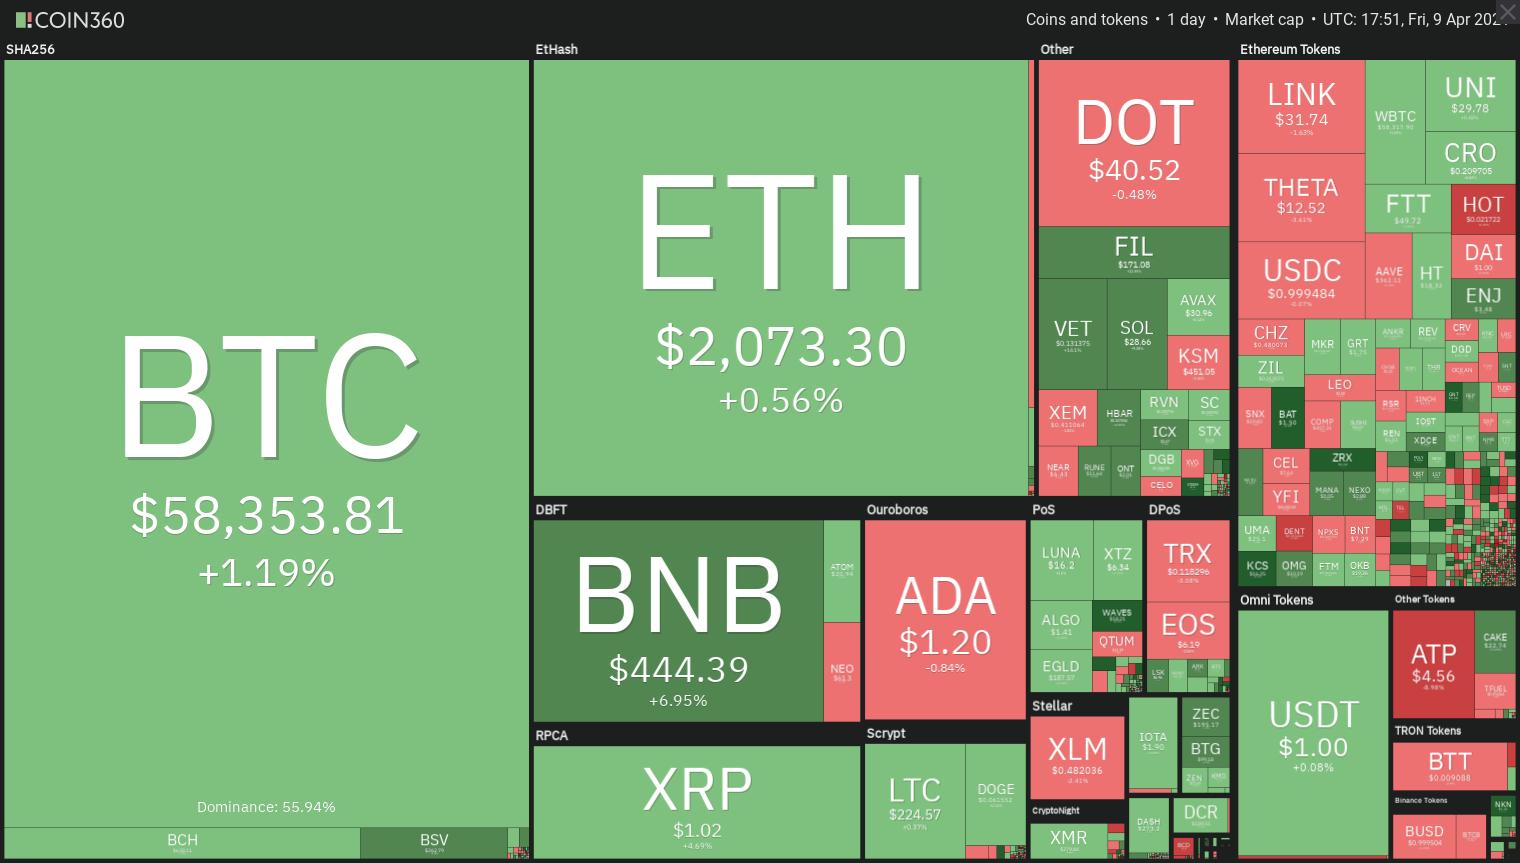 Price analysis 4/9: BTC, ETH, BNB, XRP, ADA, DOT, UNI, LTC, LINK, THETA